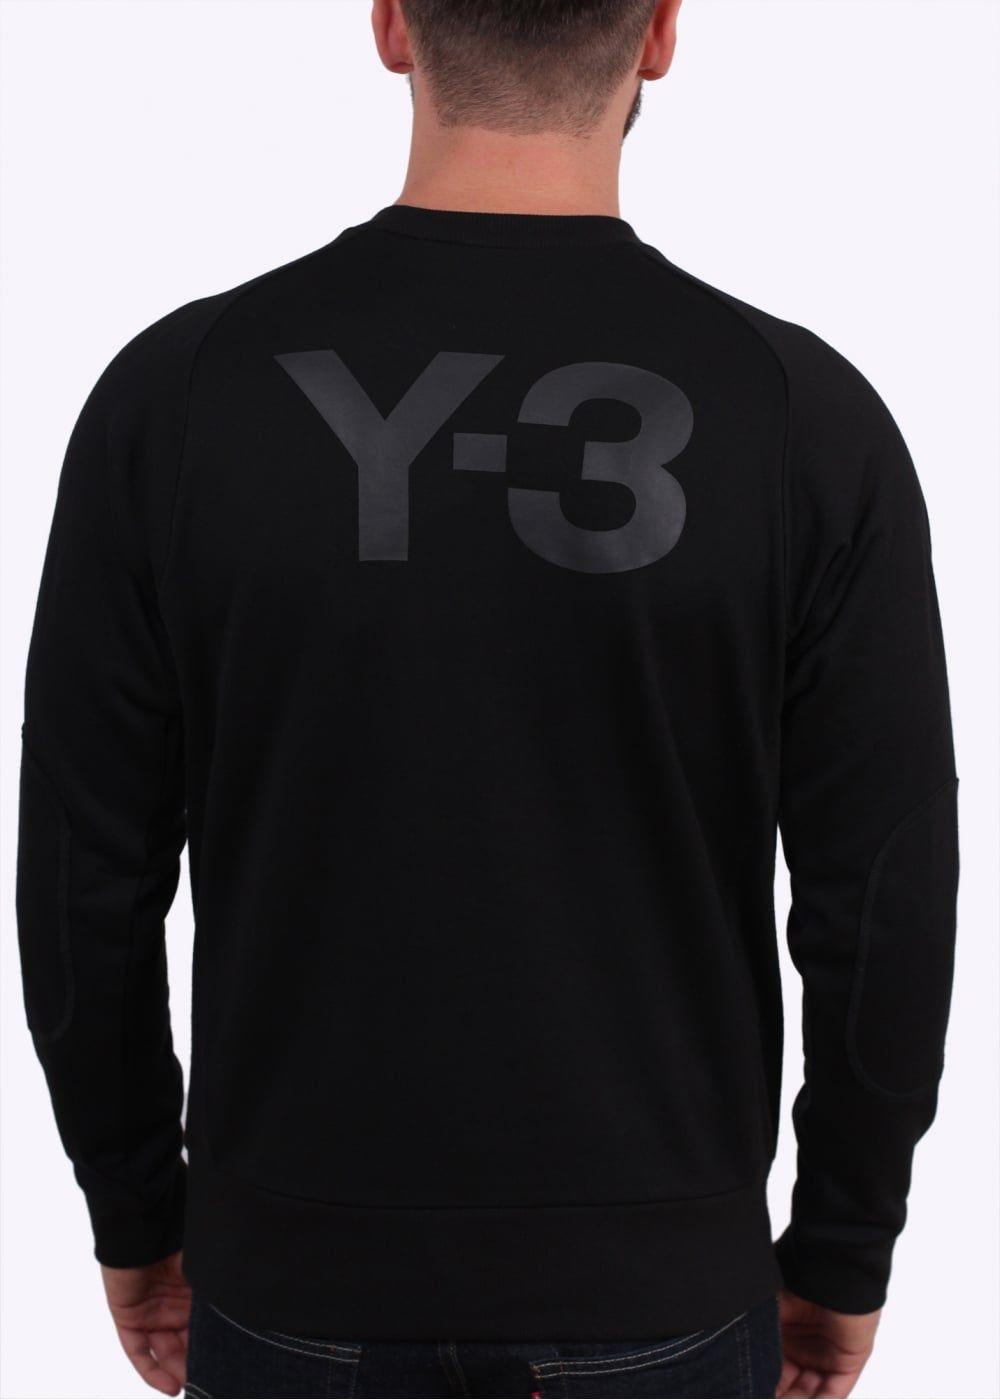 5ee9c4856 Y3   Adidas - Yohji Yamamoto CL Sweat Top - Black